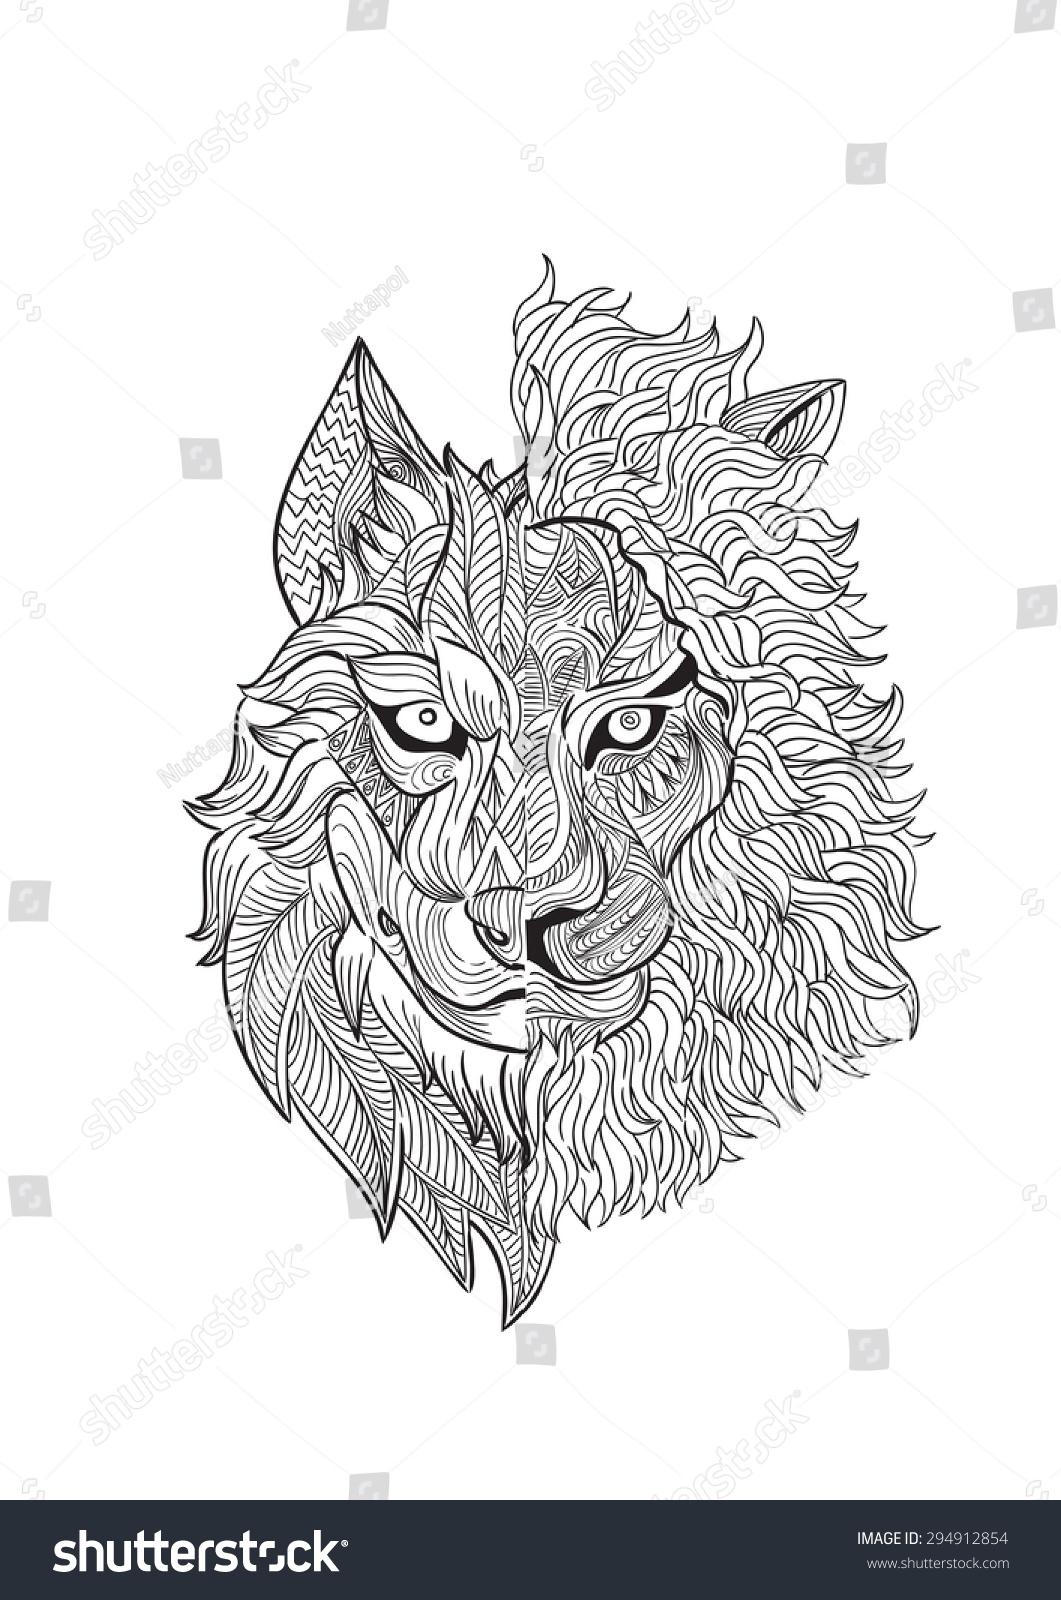 Hand Draw Half Wolf Half Lion Stock Vector